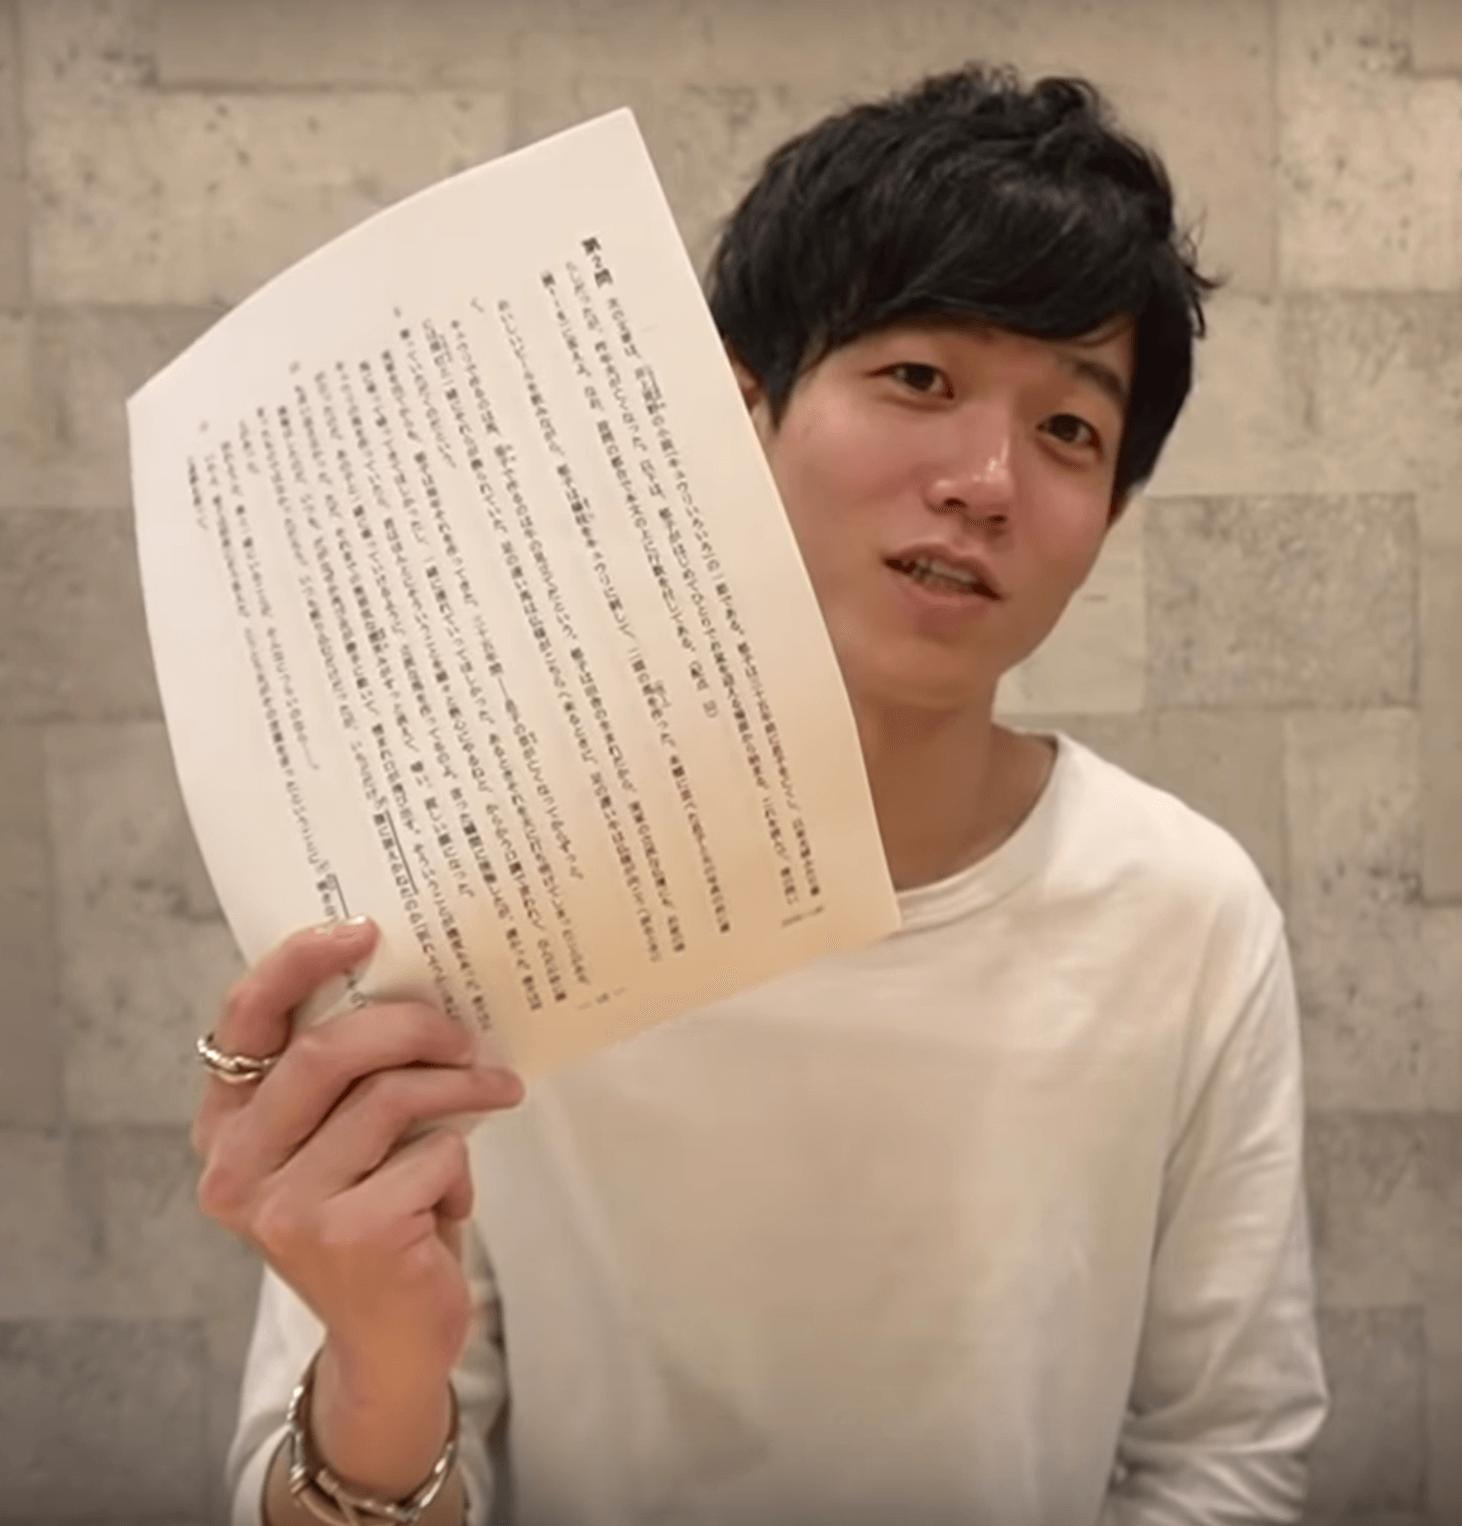 【Atsueigo】経歴や出身大学・身長は?英単語帳の評判も気になる!TOEIC満点に近づく文法やリスニングの勉強法とは